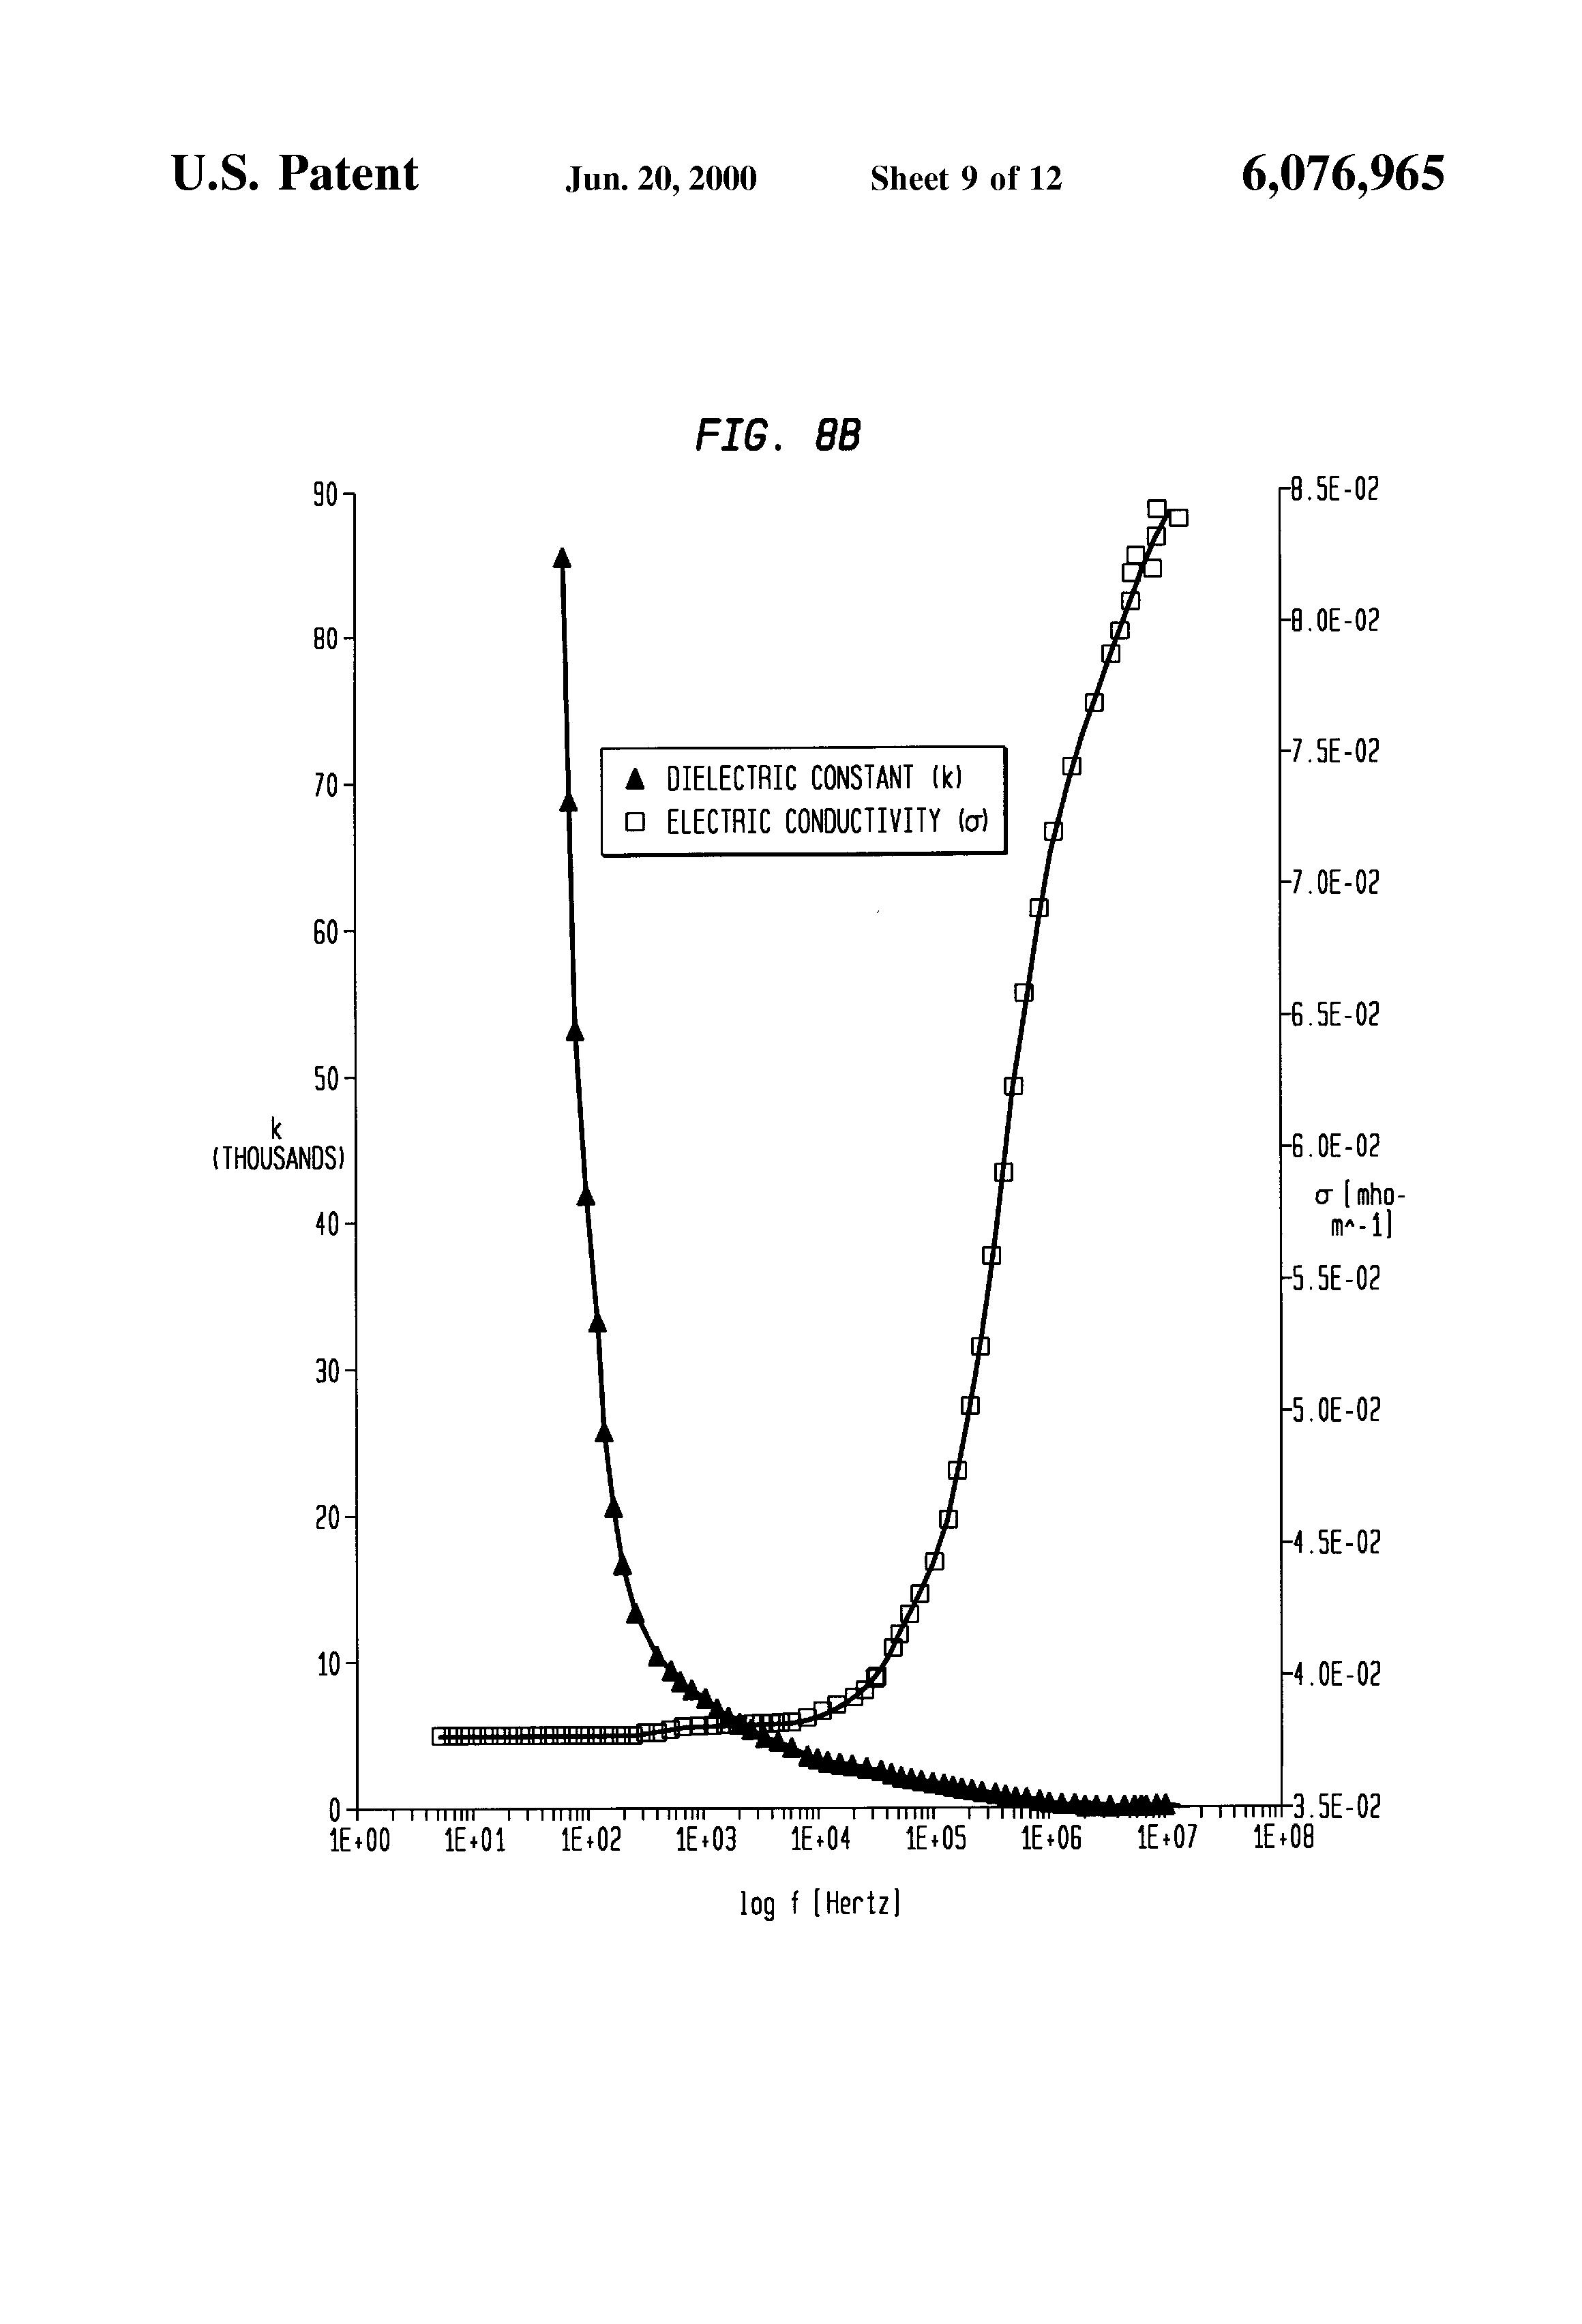 cobalt oxide lewis diagram 1999 jeep wrangler fuse patent us6076965 monocrystal of nickel manganese